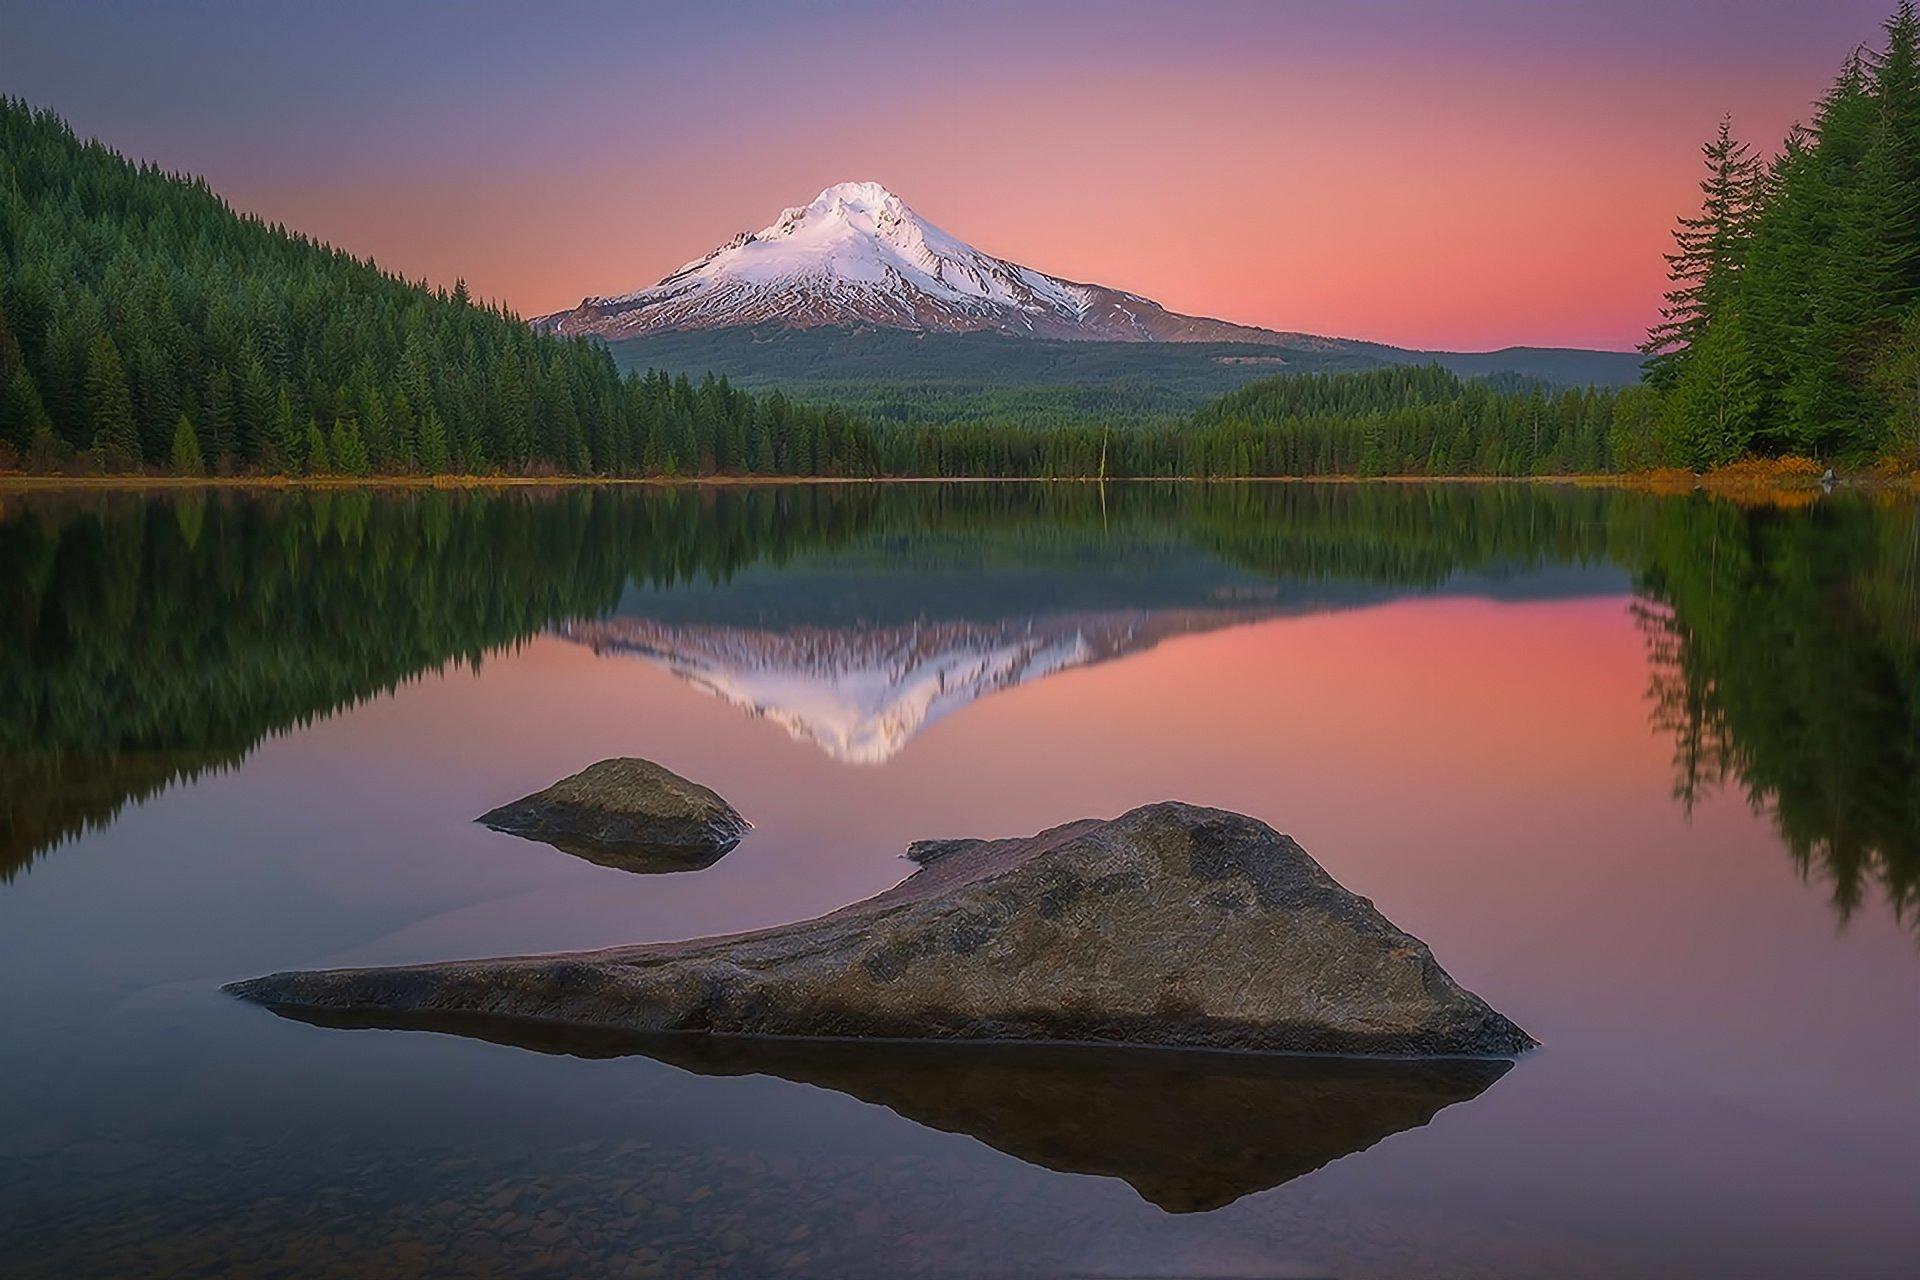 Landscape nature mountains lake forest reflection sunset - Oregon nature wallpaper ...